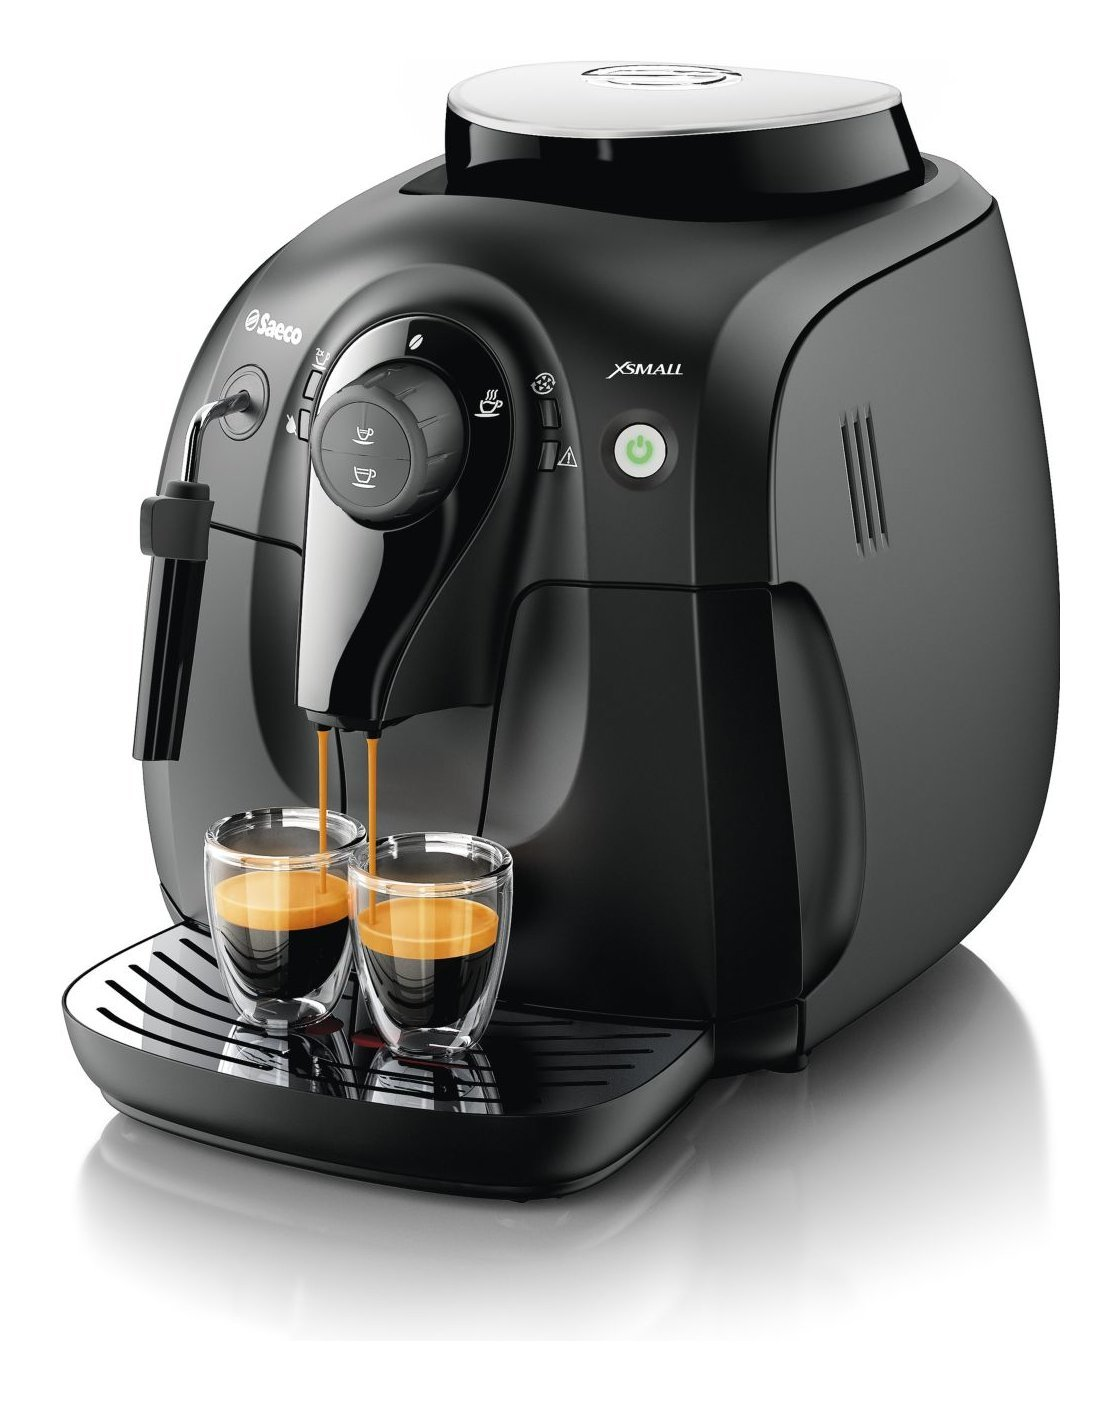 Saeco máquina de café automática HD8645/01 15 bar color negro: Amazon.es: Hogar